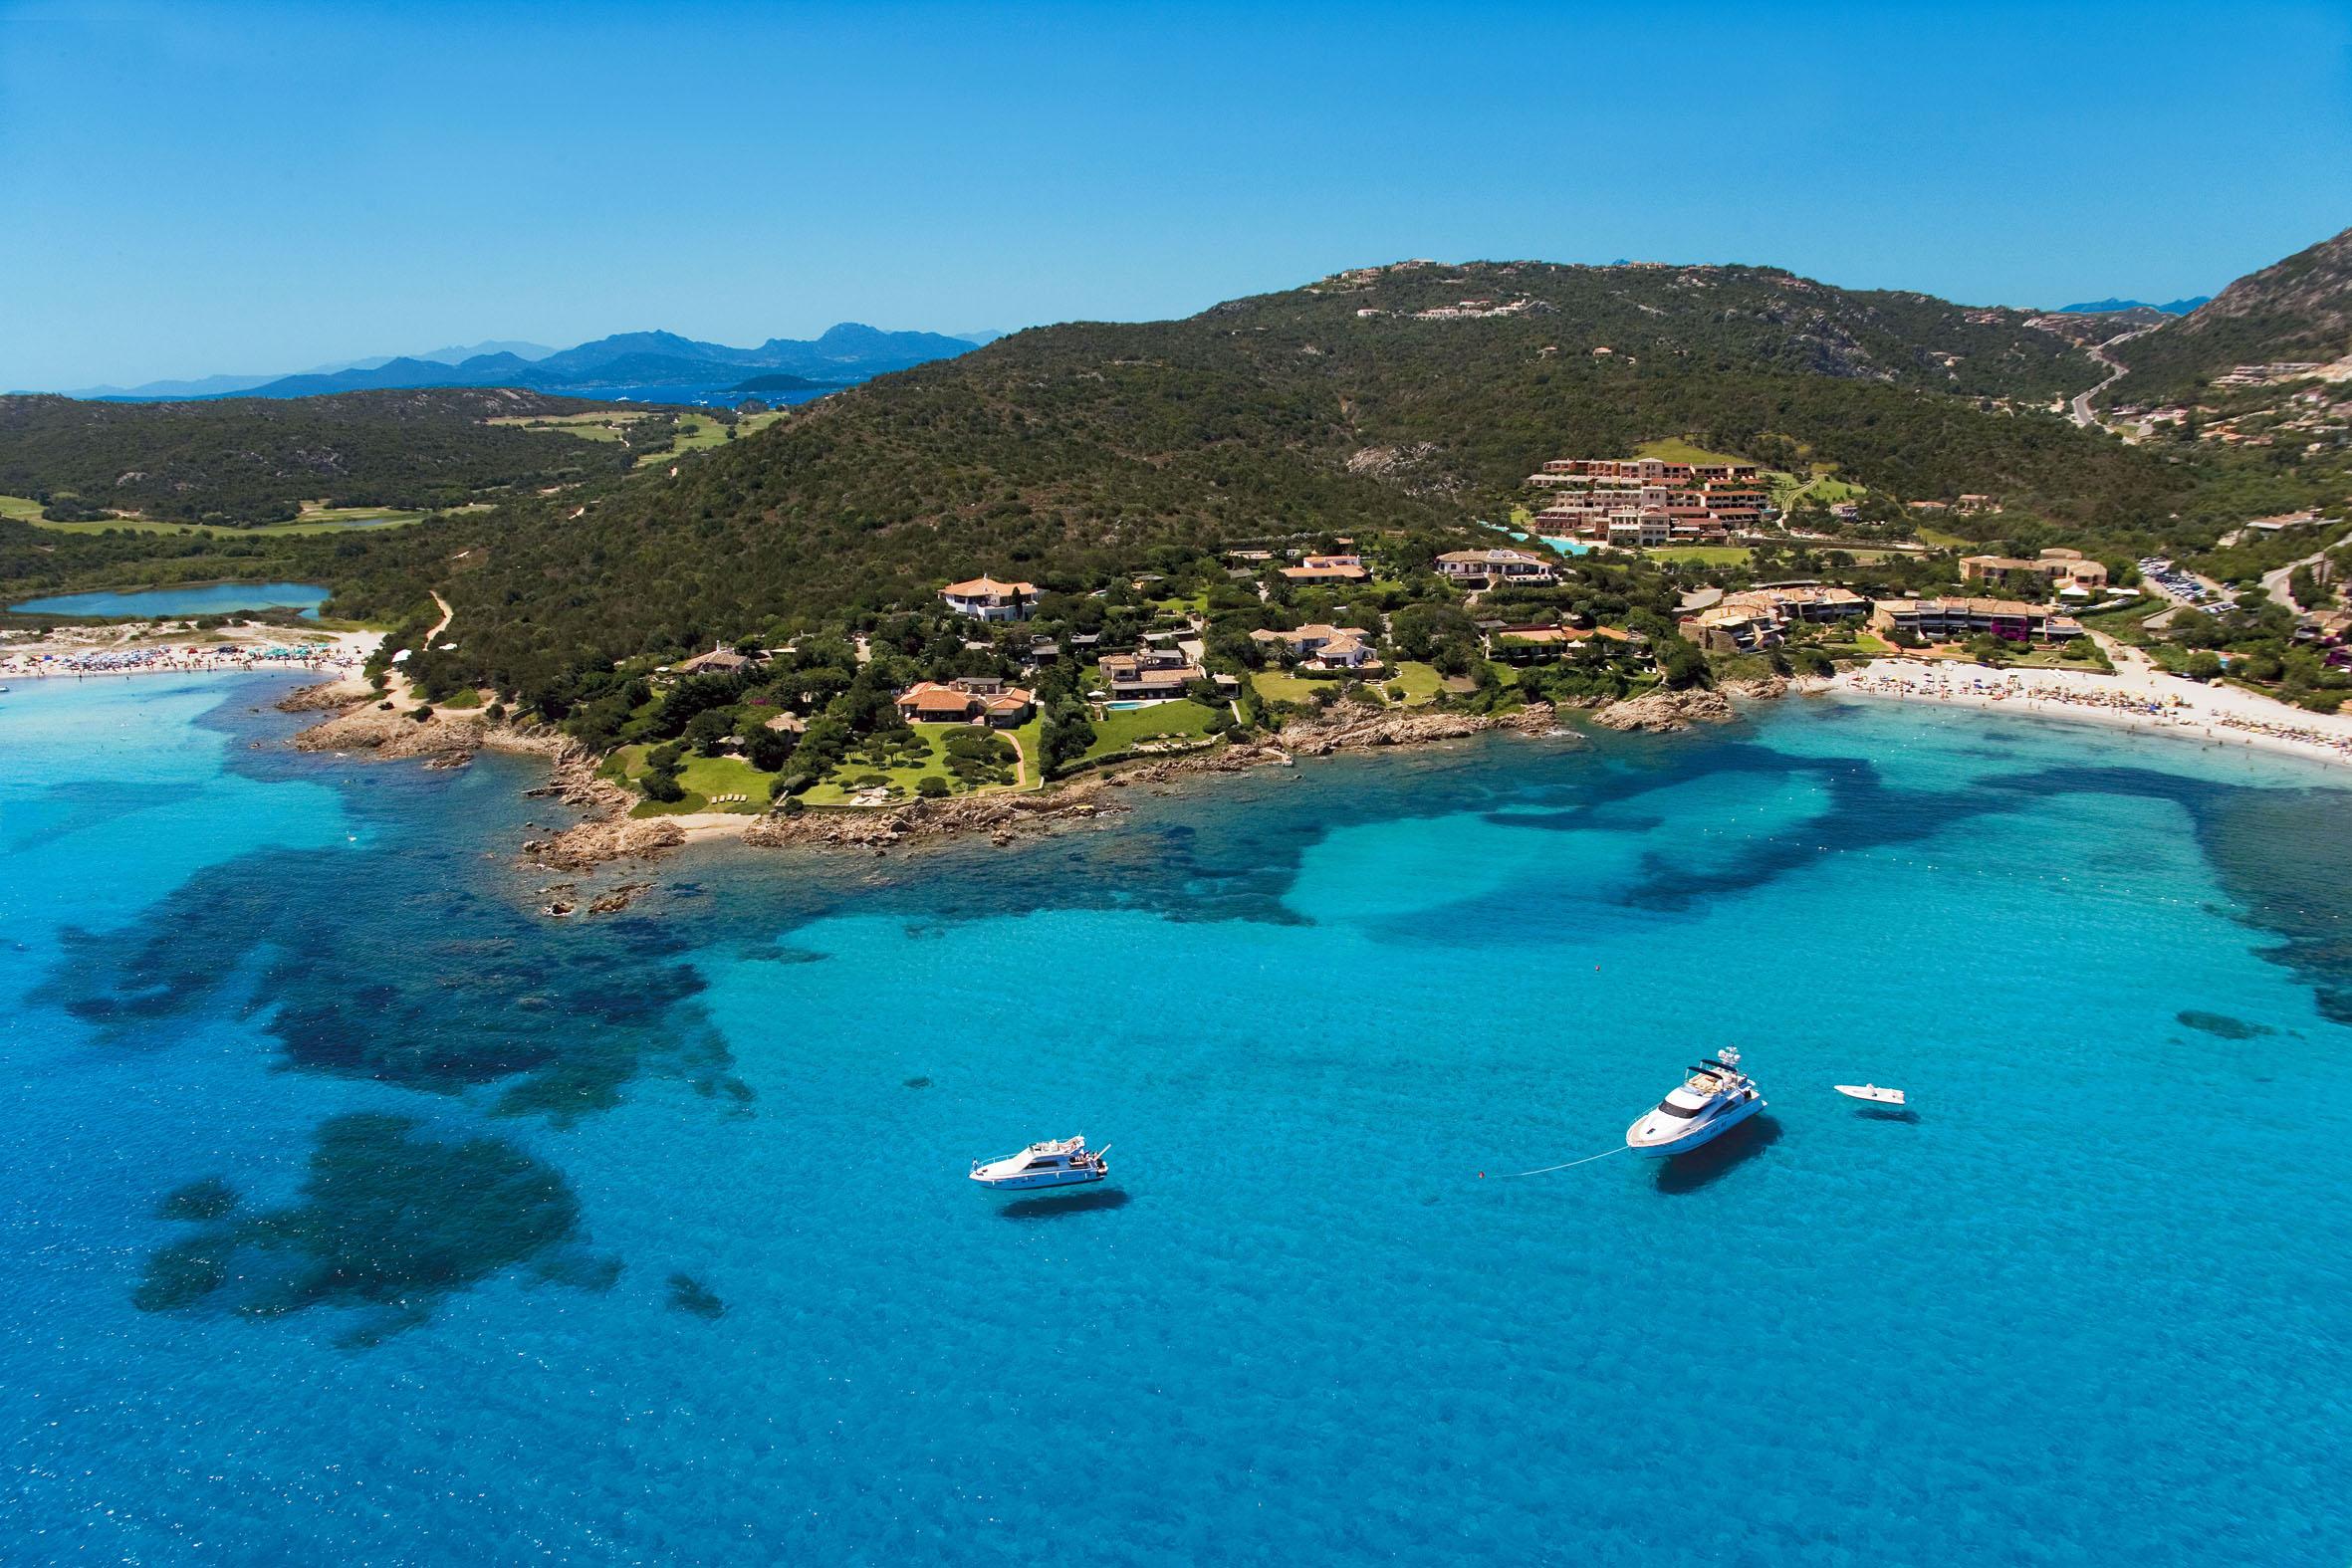 The village of Porto Cervo is located along Sardinia's Emerald Coast